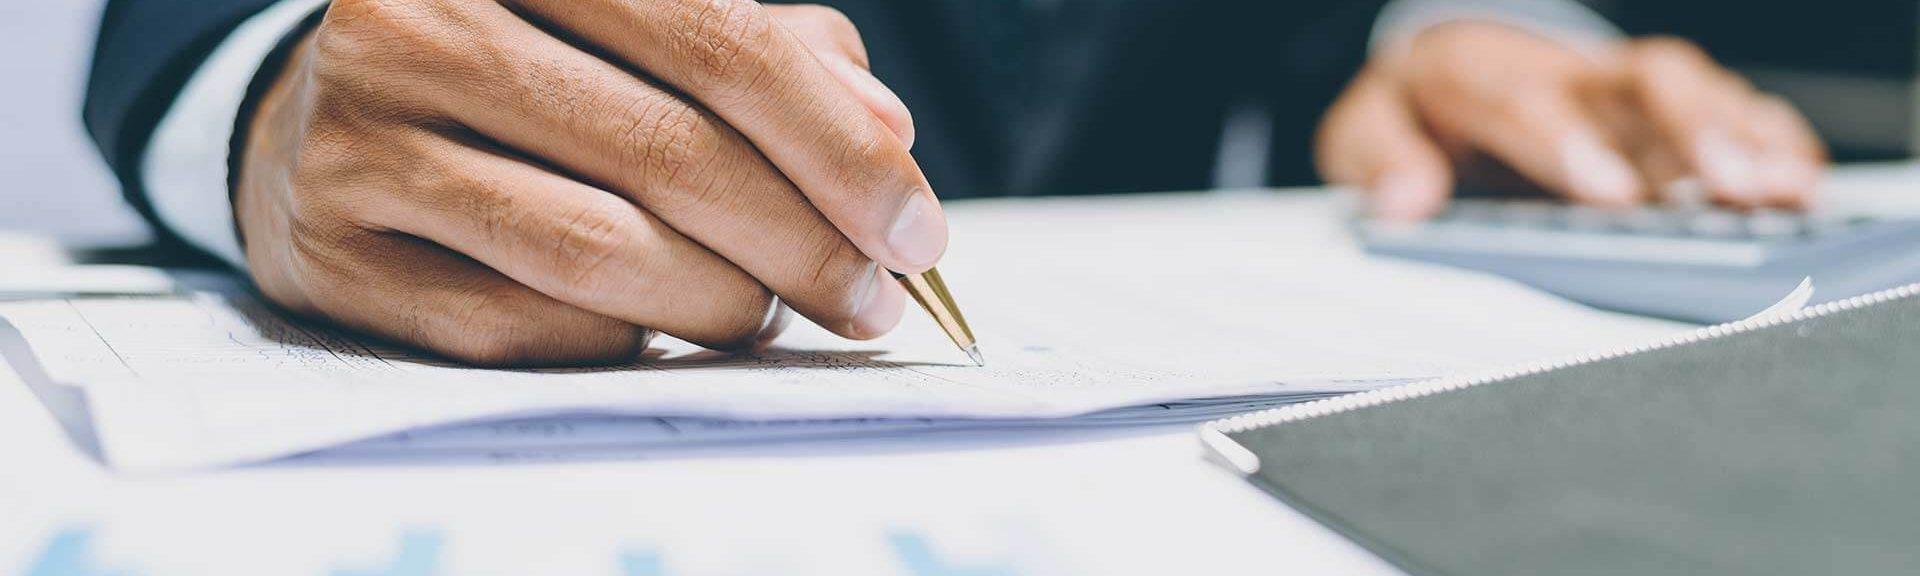 Biuro Rachunkowe w Luboniu – A&P Finance